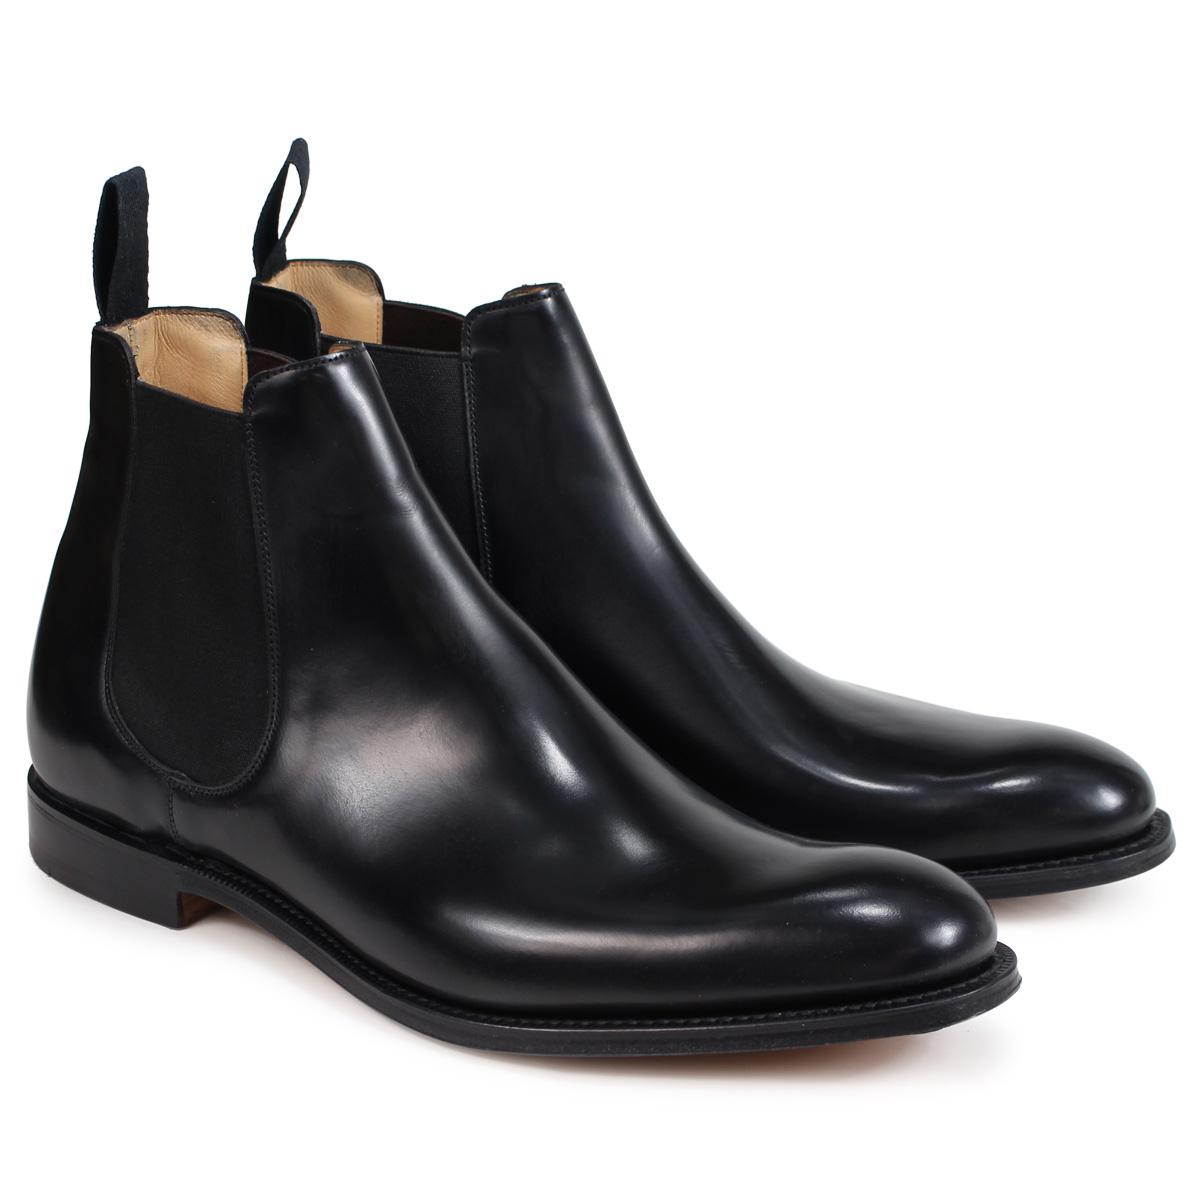 Churchs NIRAH 2 チャーチ 靴 レディース ニラー2 サイドゴア ショートブーツ POLISHED BINDER DT0039 ブラック